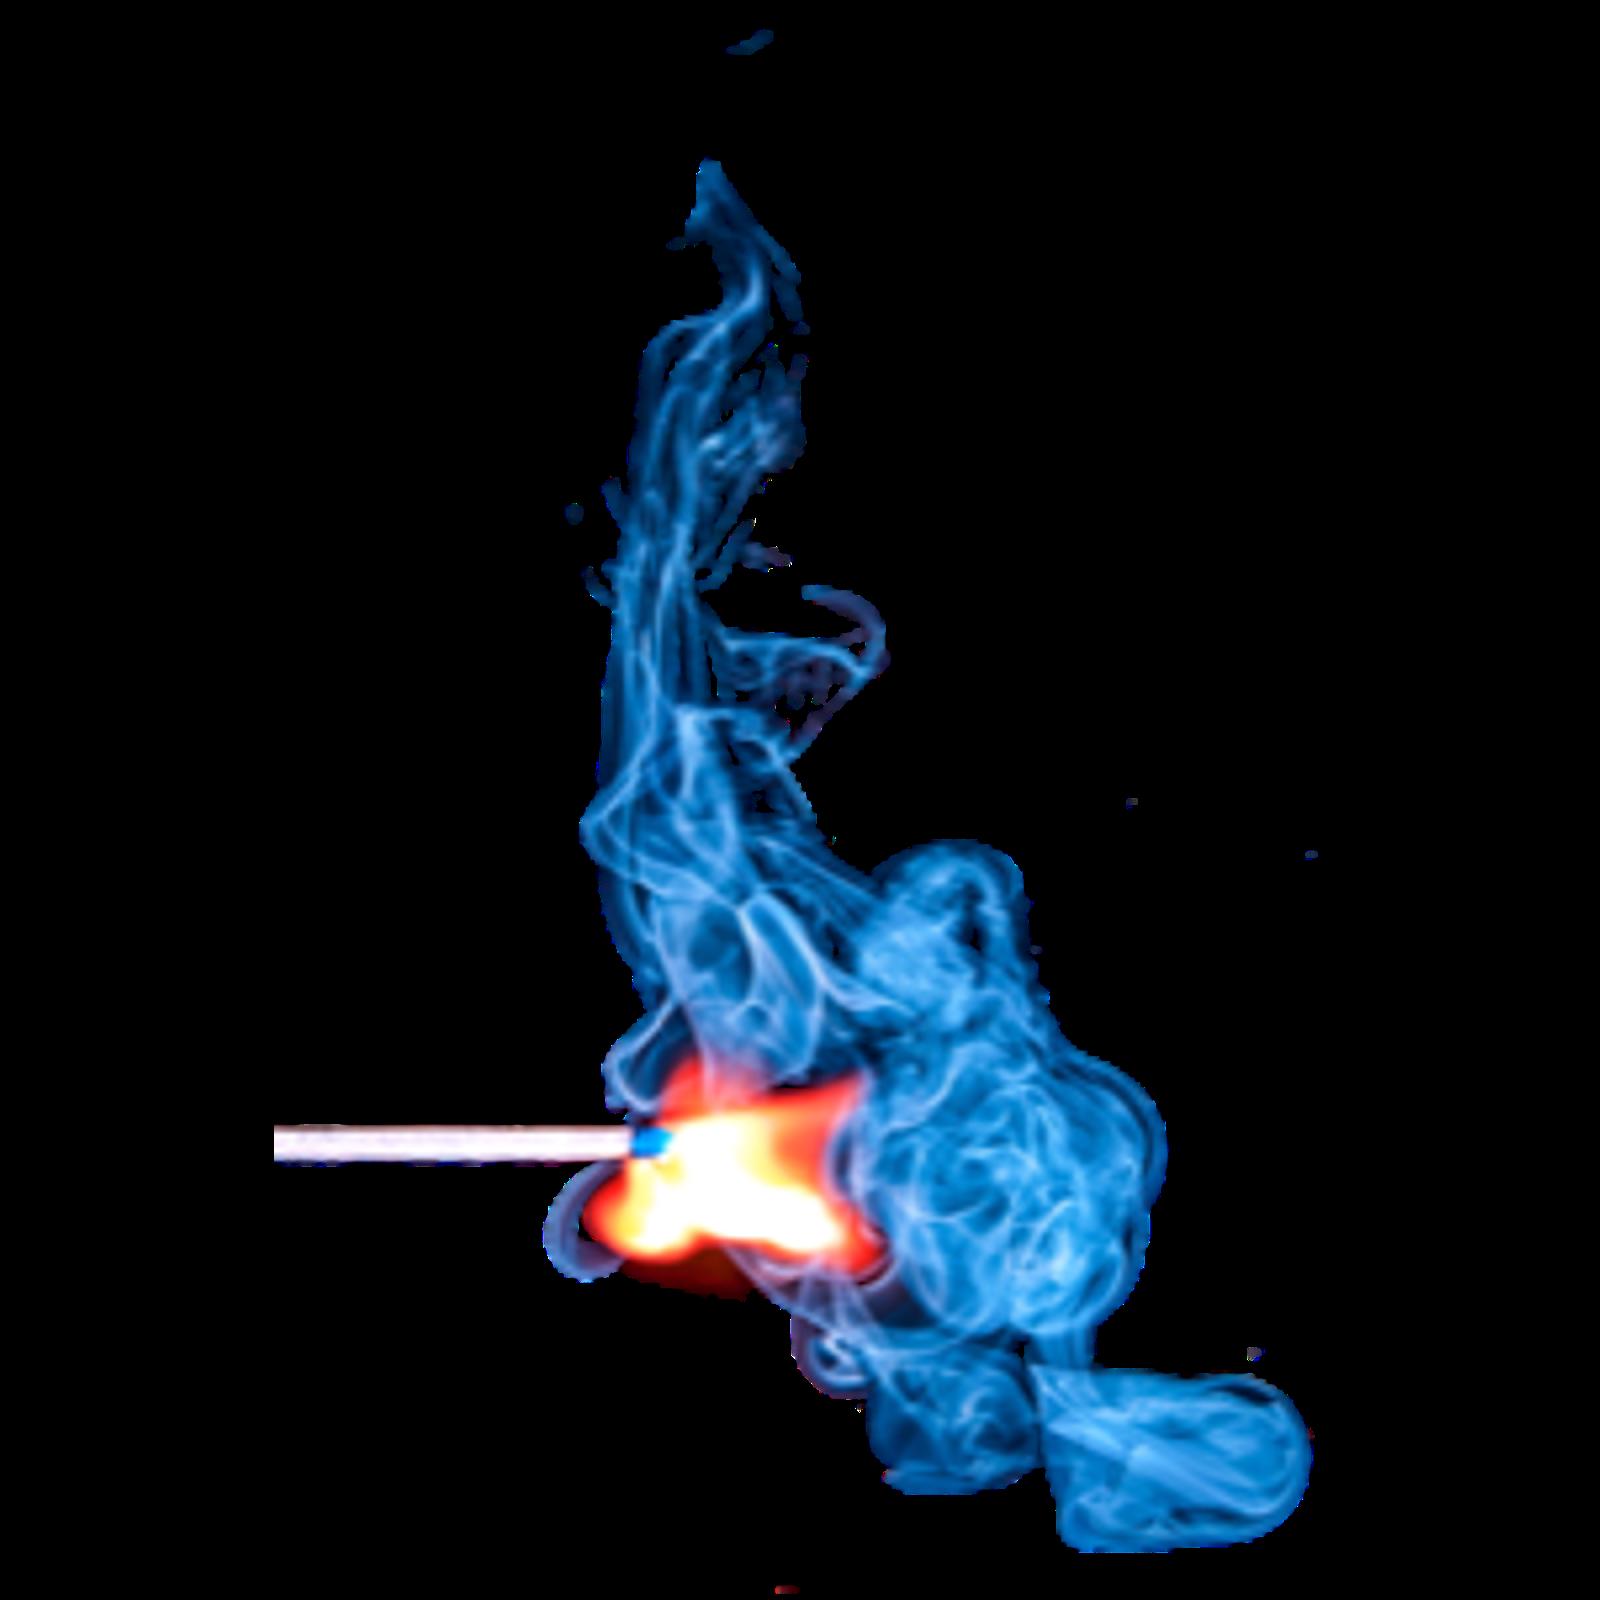 Clip art on transparent. Match clipart fire spark